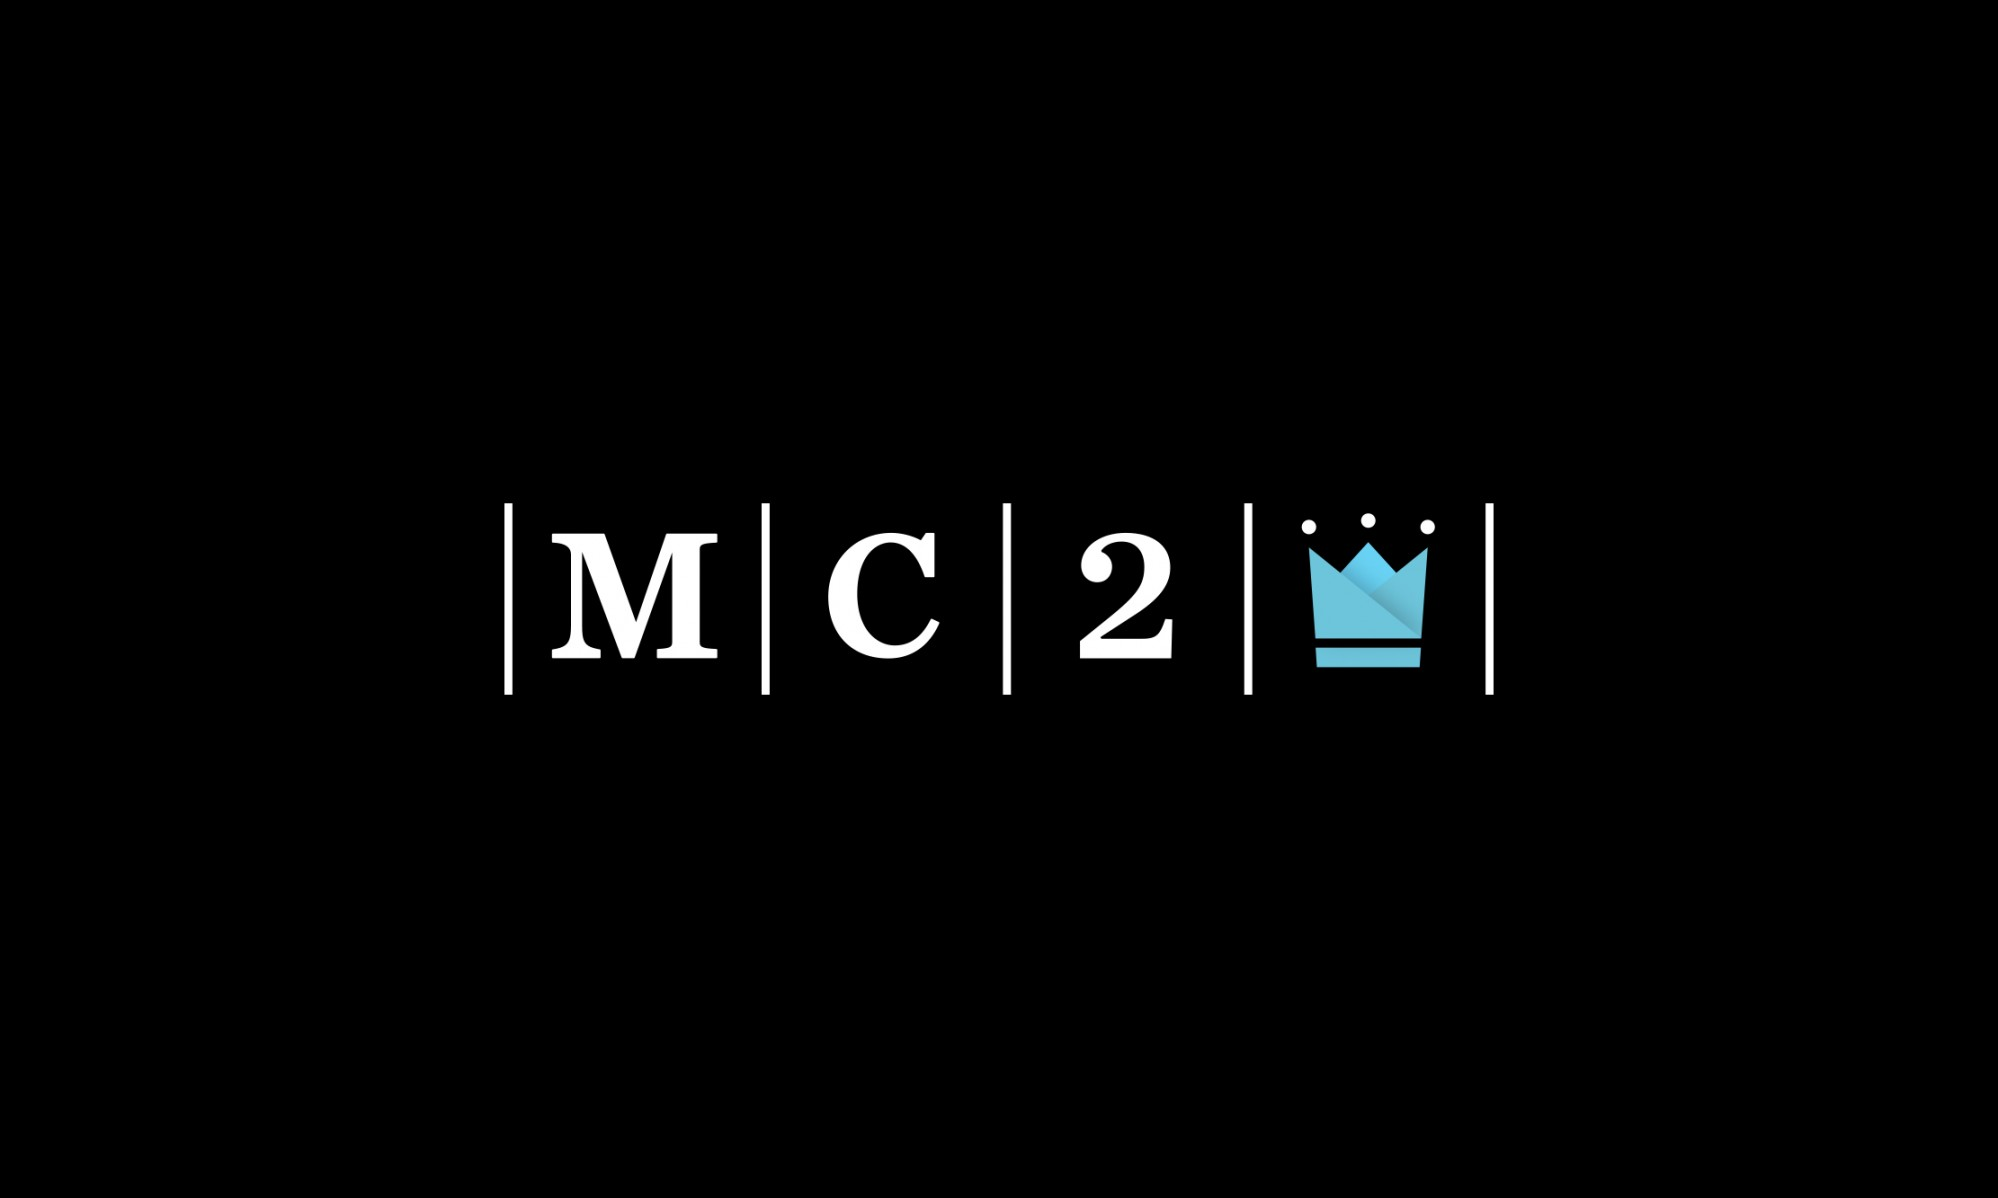 DanBlackman_MC2_14-1998x1198